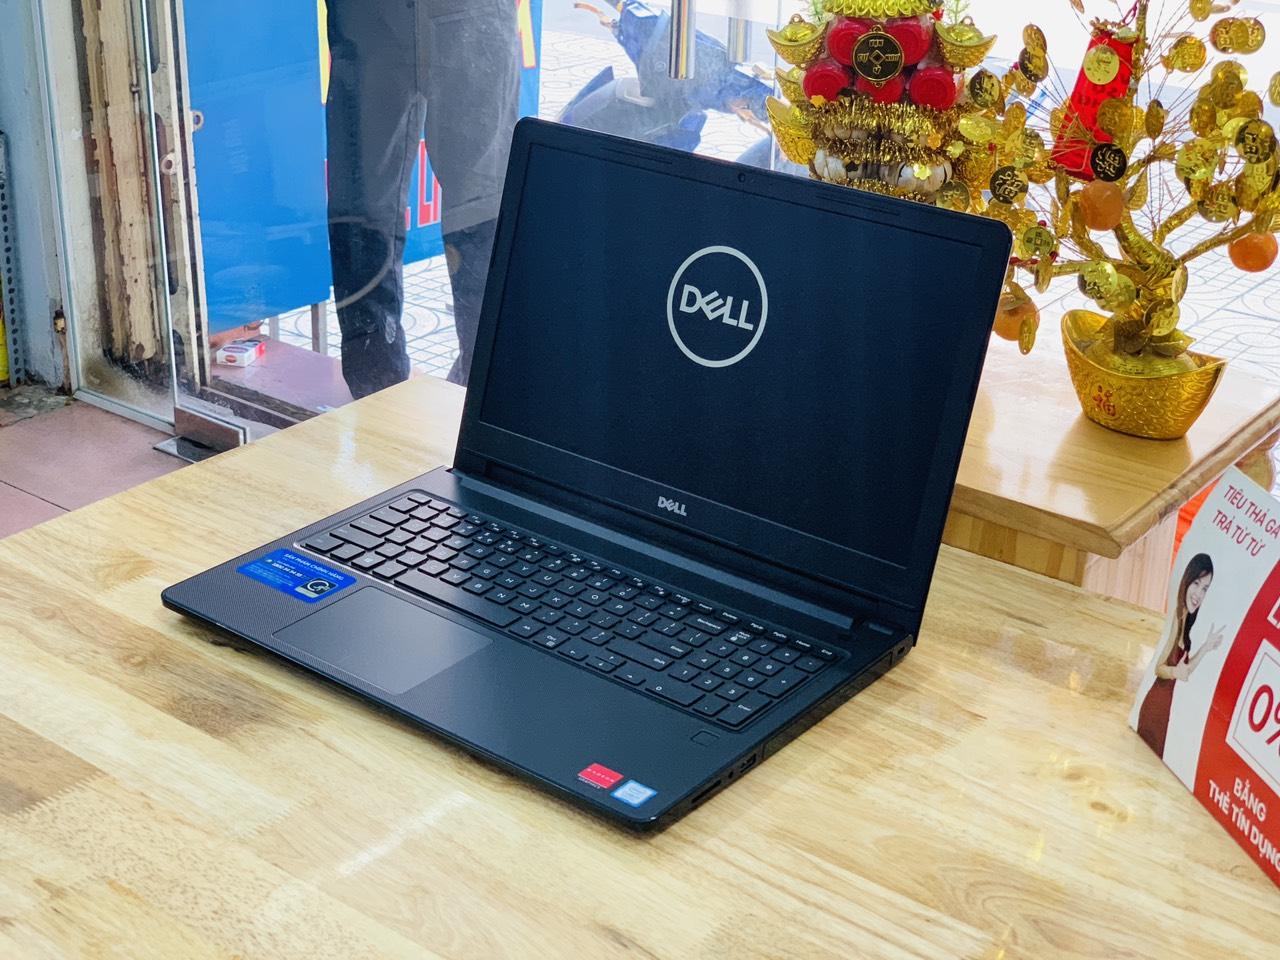 Dell inspiron 3578 i7